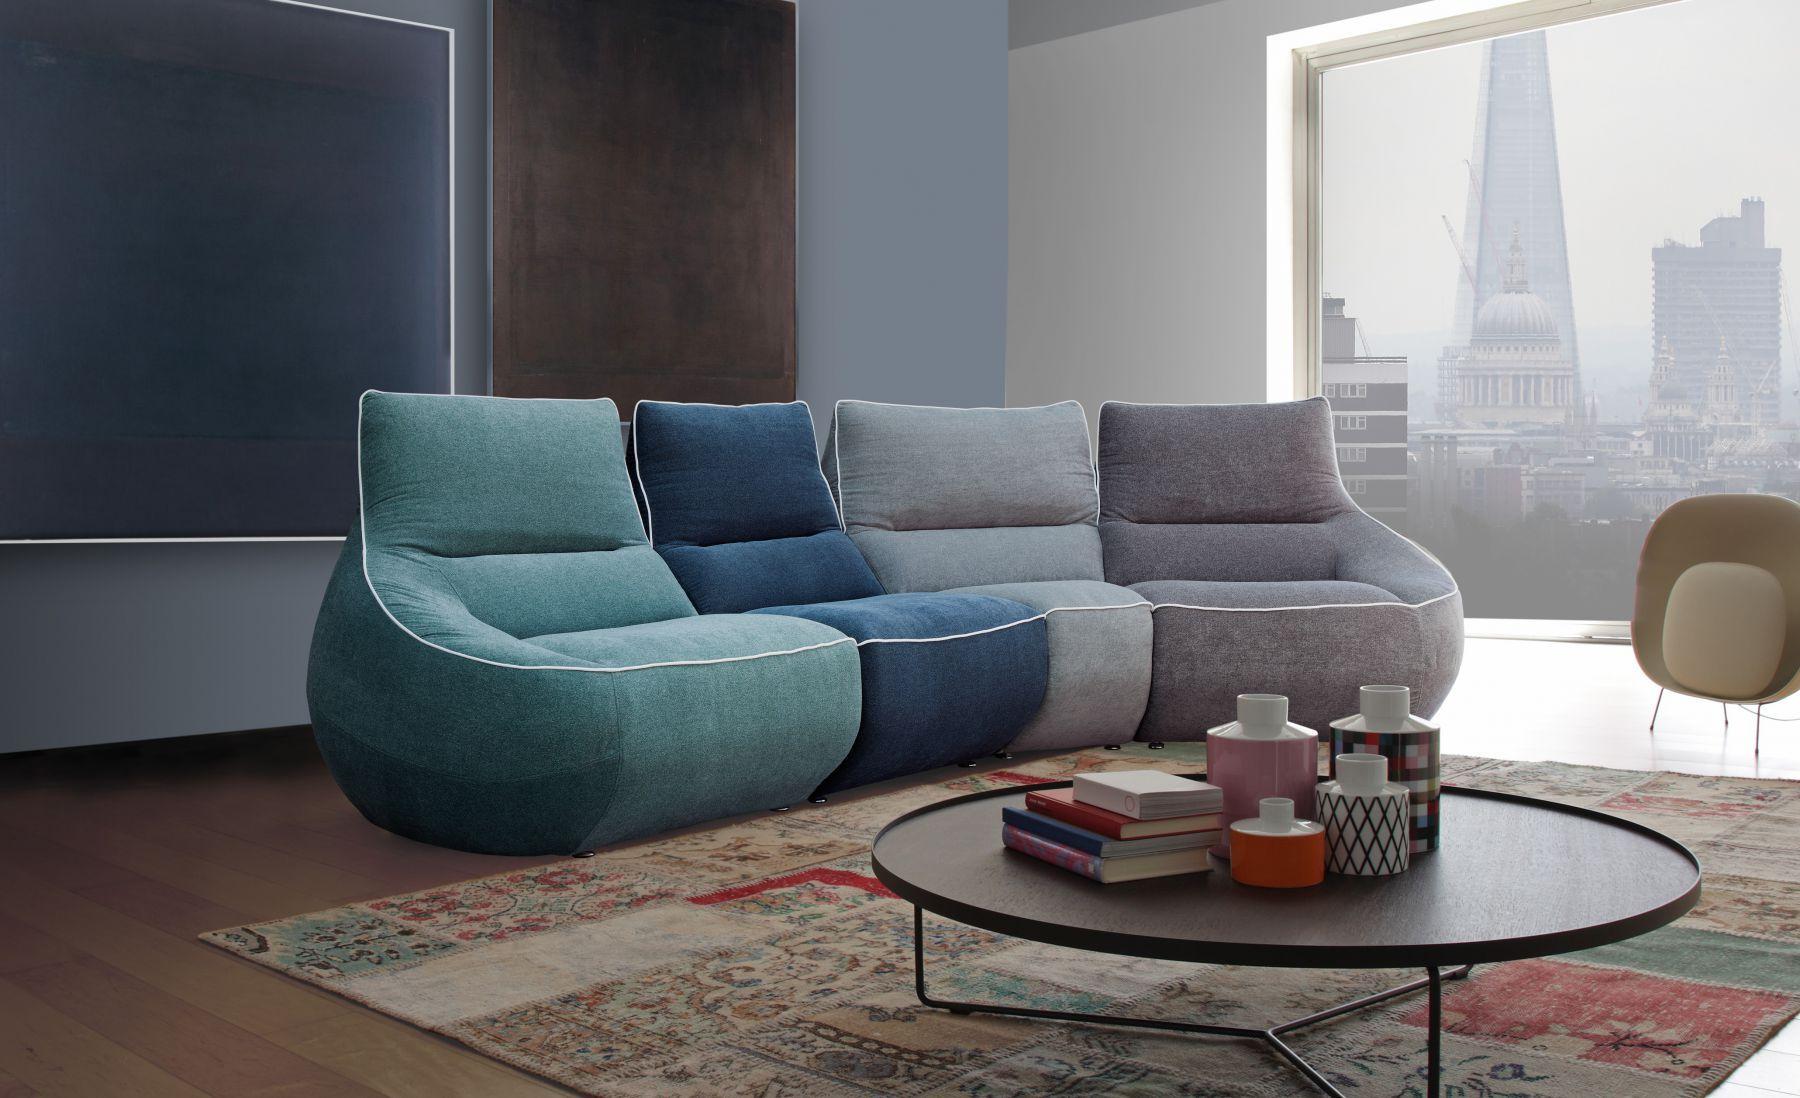 Calia Italia Rumba Rumba Furniture Sofa